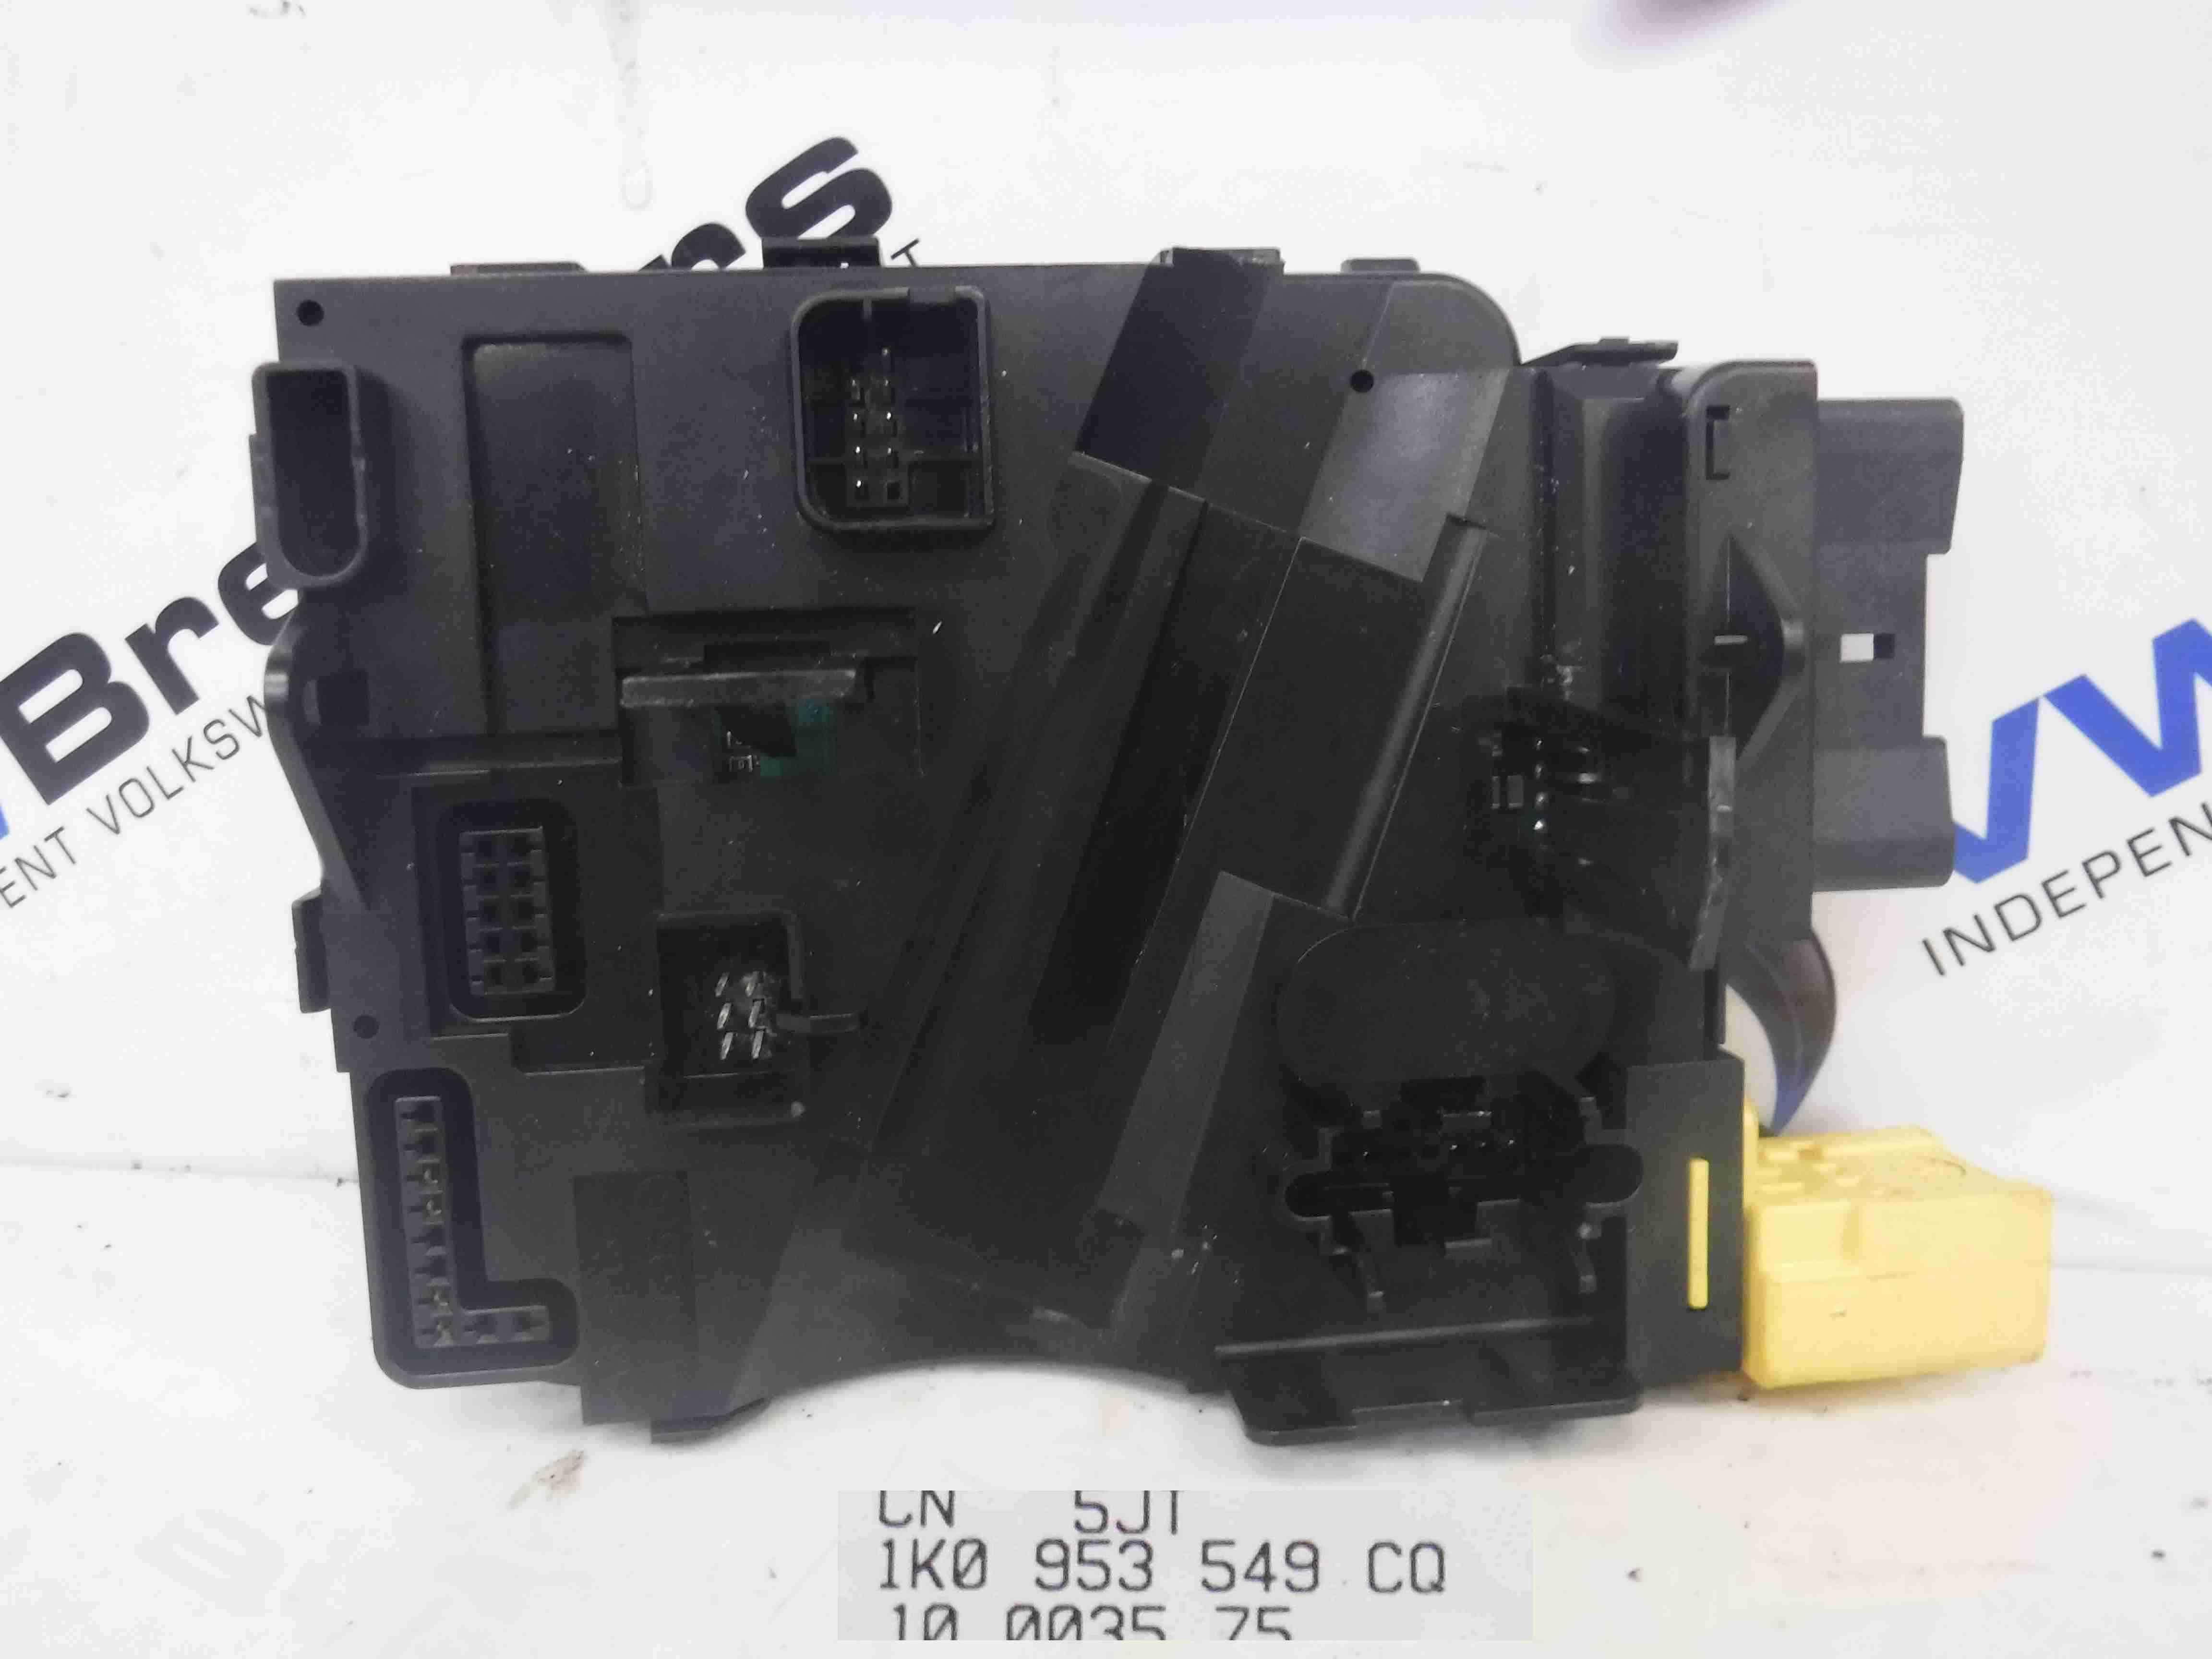 Volkswagen Golf MK6 2009-2012 Steering Control ECU Module 1K0953549CQ